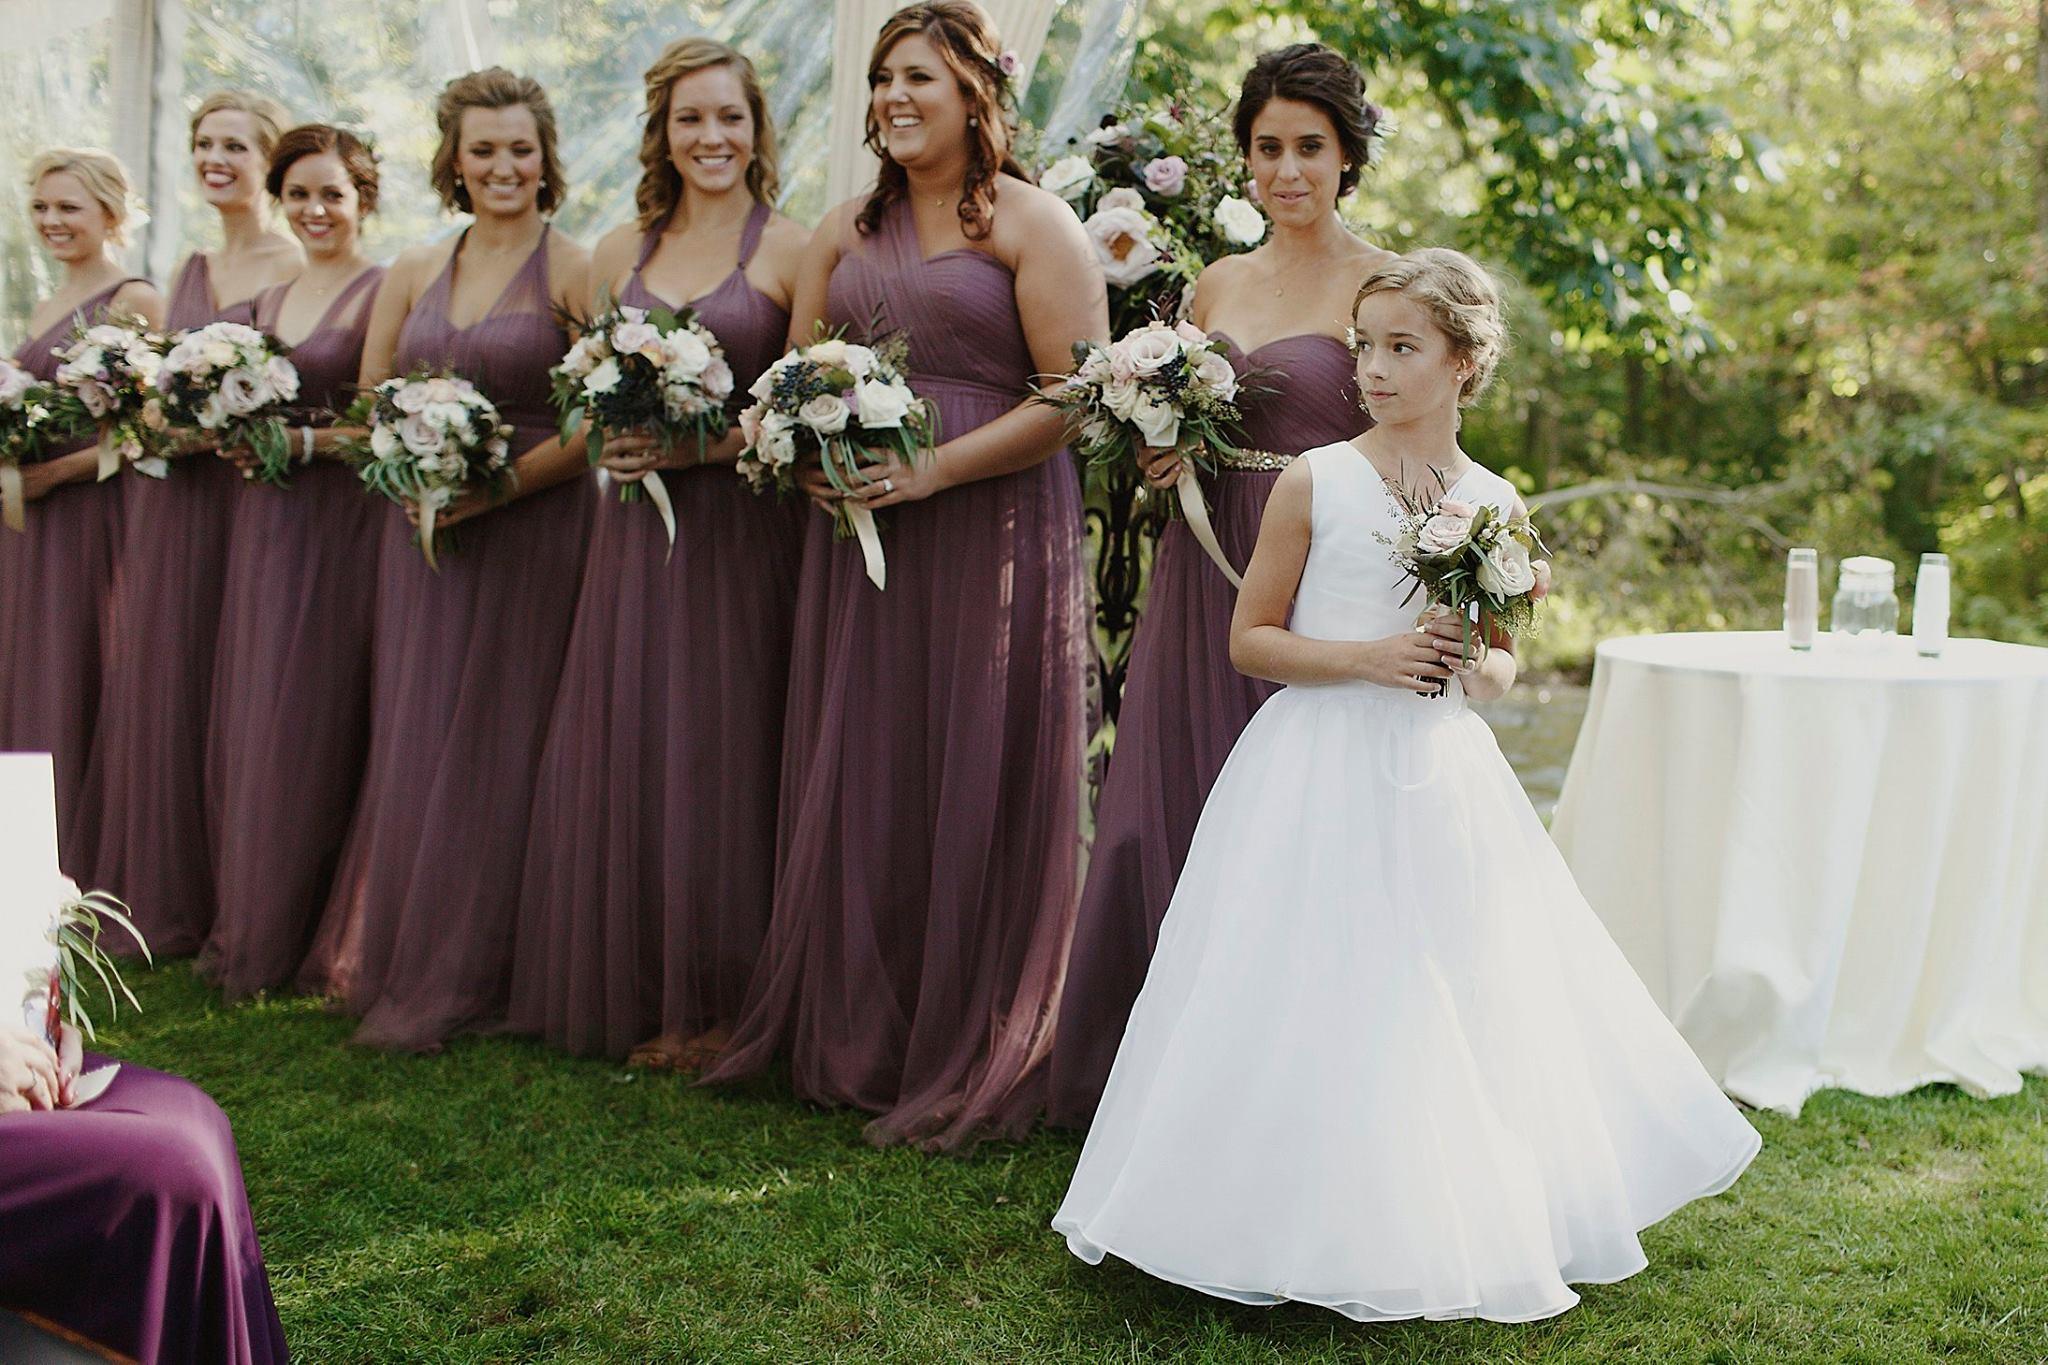 Grand Rapids, Michigan Wedding Flower Girl Photos